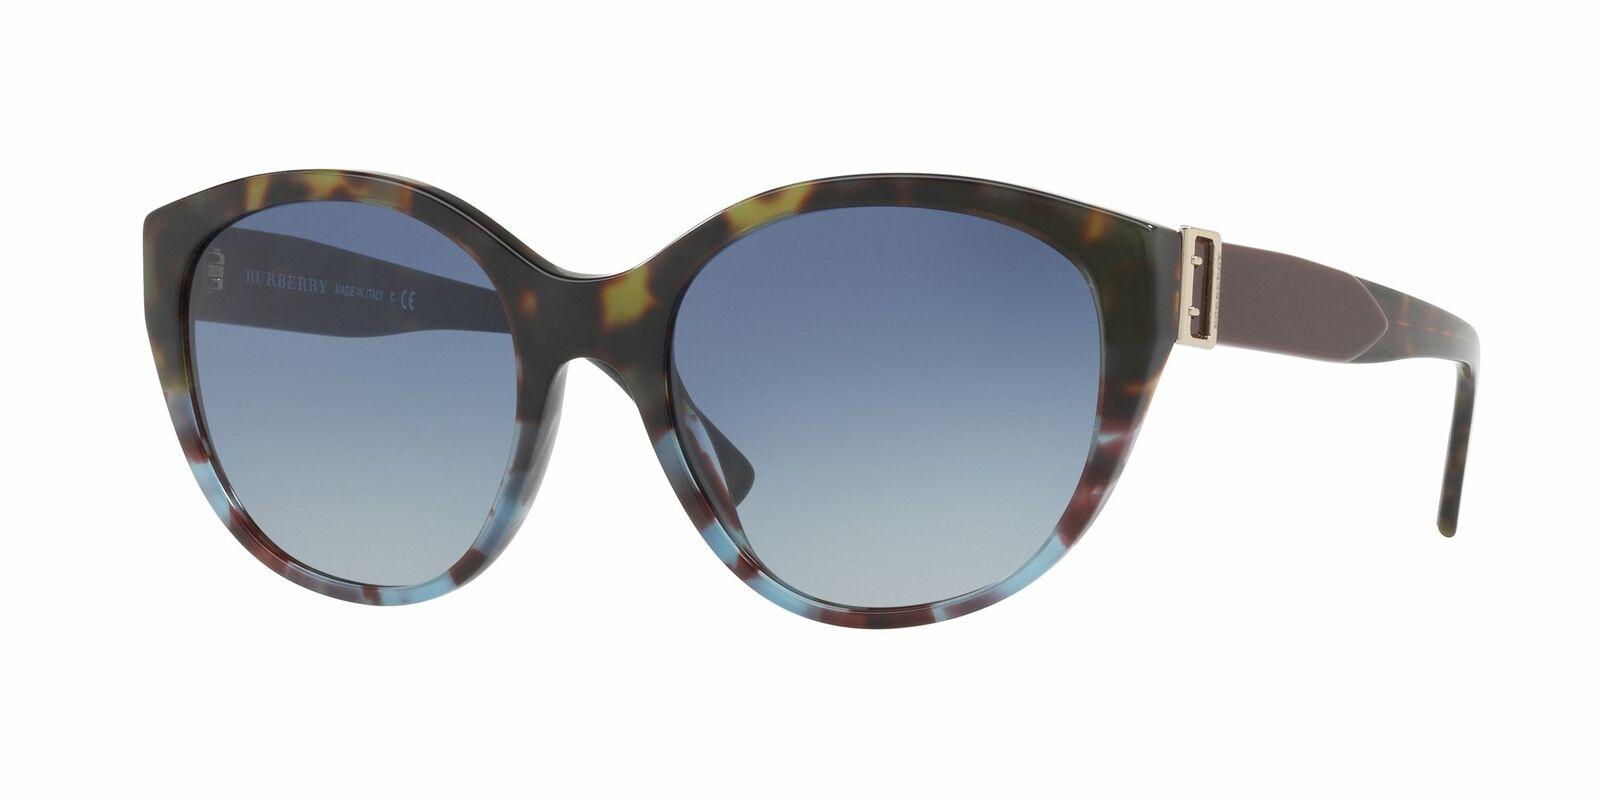 Authentic Burberry 4242 - 36364L Sunglasses GREEN HAVANA/BLUE HAVANA *NEW* 55mm